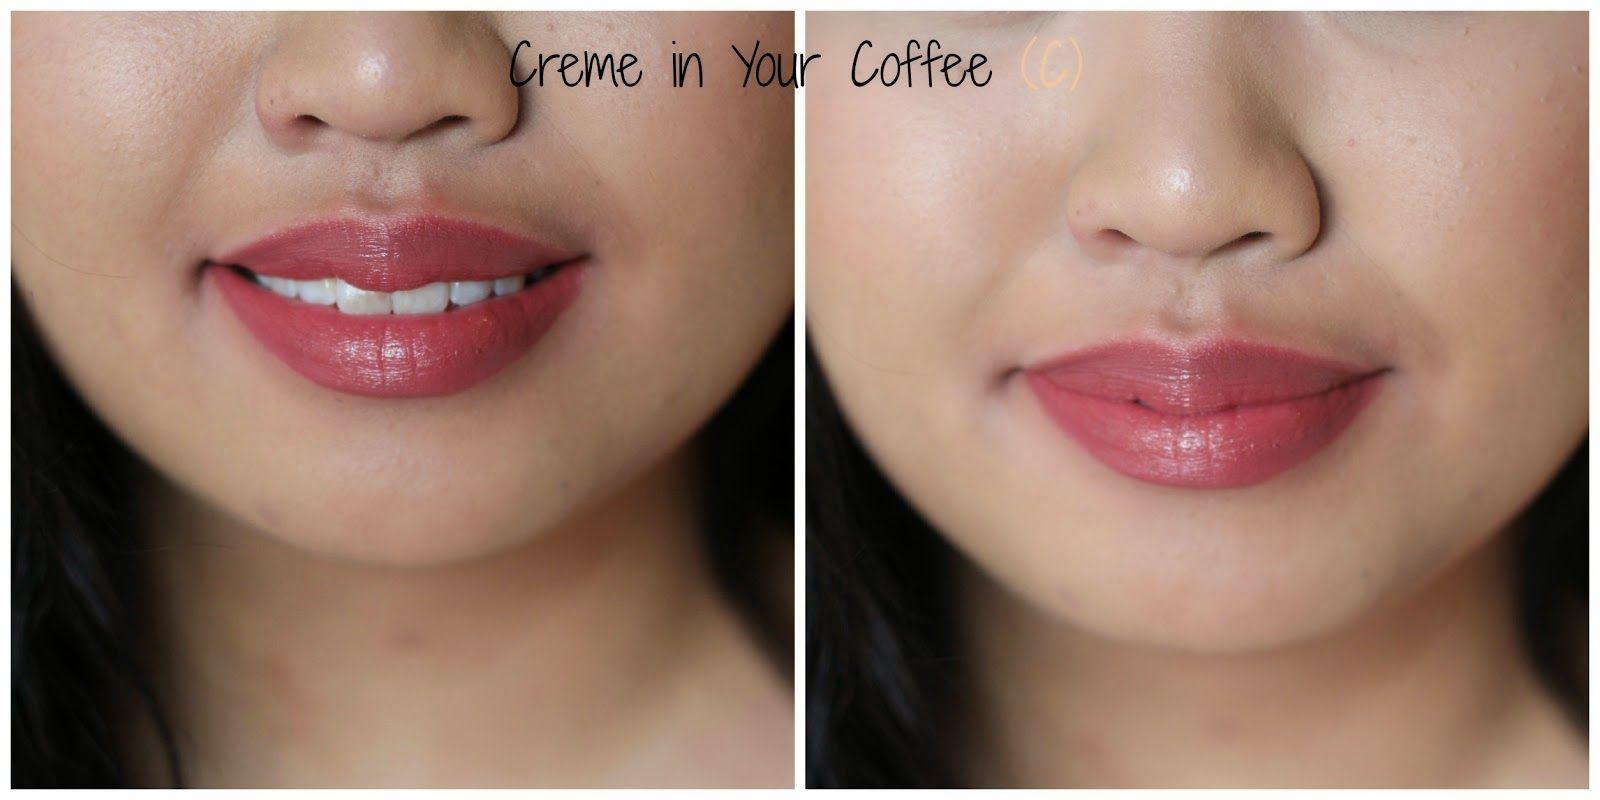 Mac Creme In Your Coffee Mac Lipstick Collection Mac